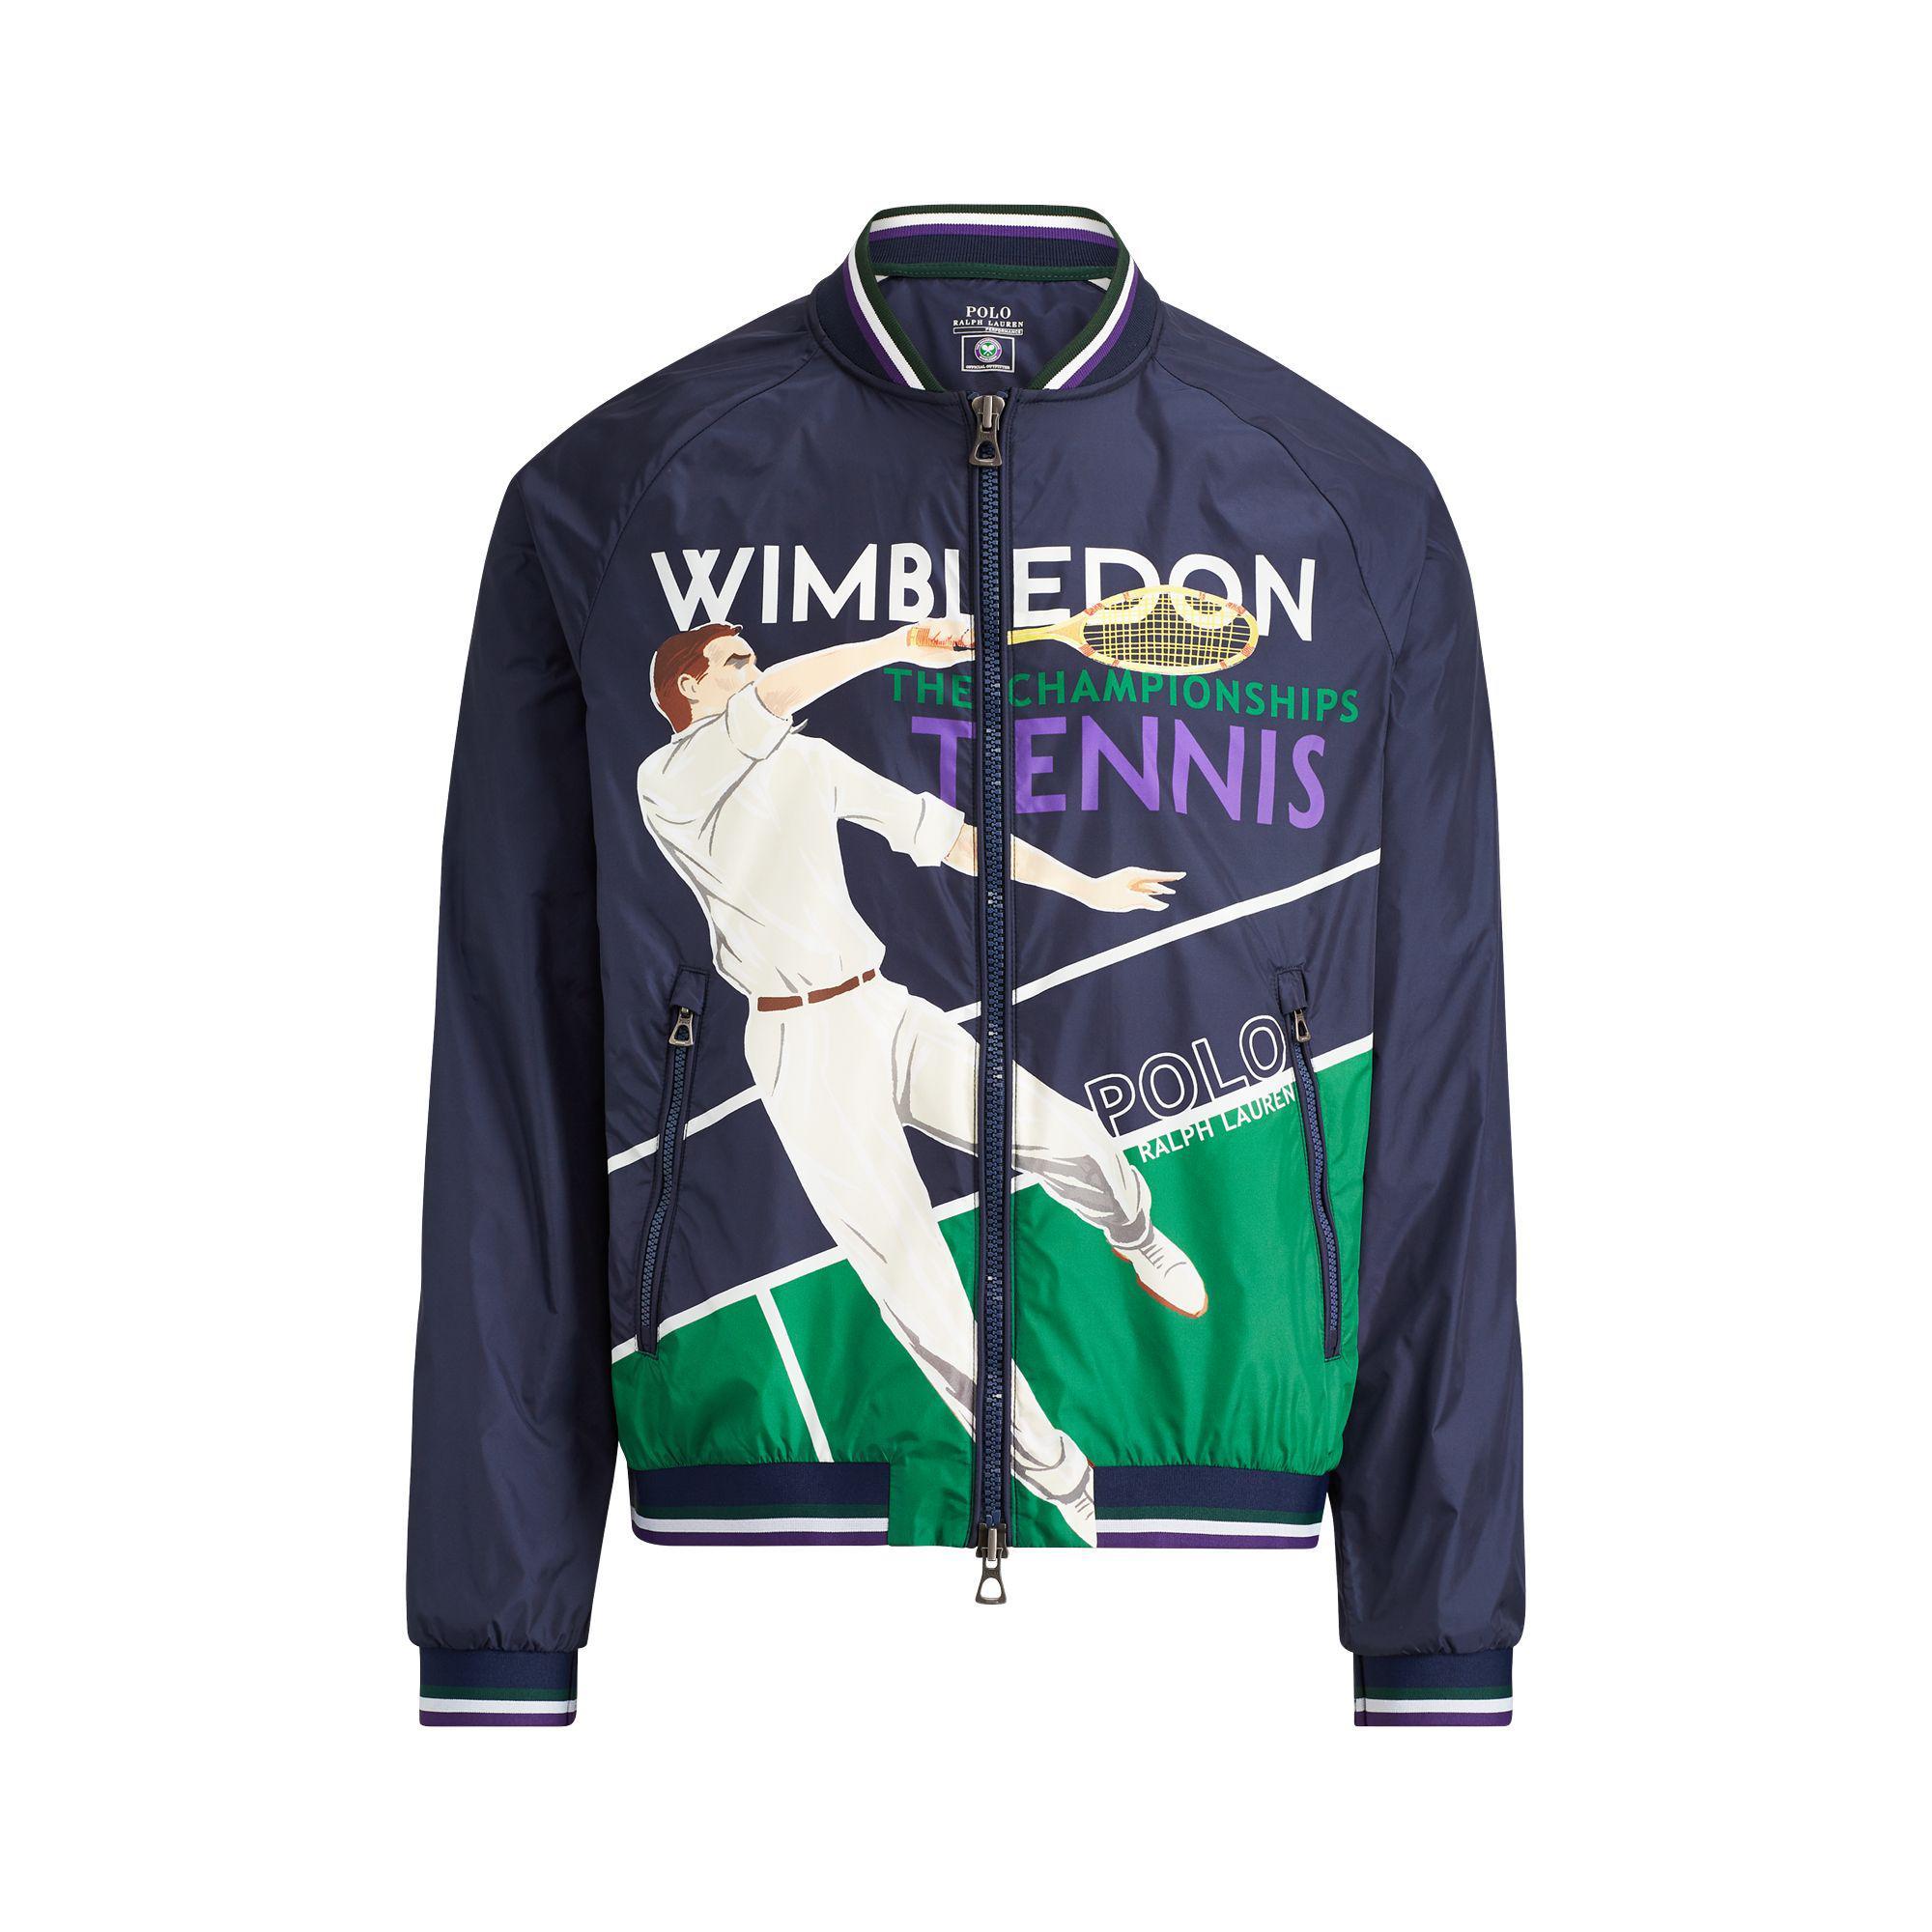 0b67b24cb580 Polo Ralph Lauren Wimbledon Print Windbreaker in Blue for Men - Lyst